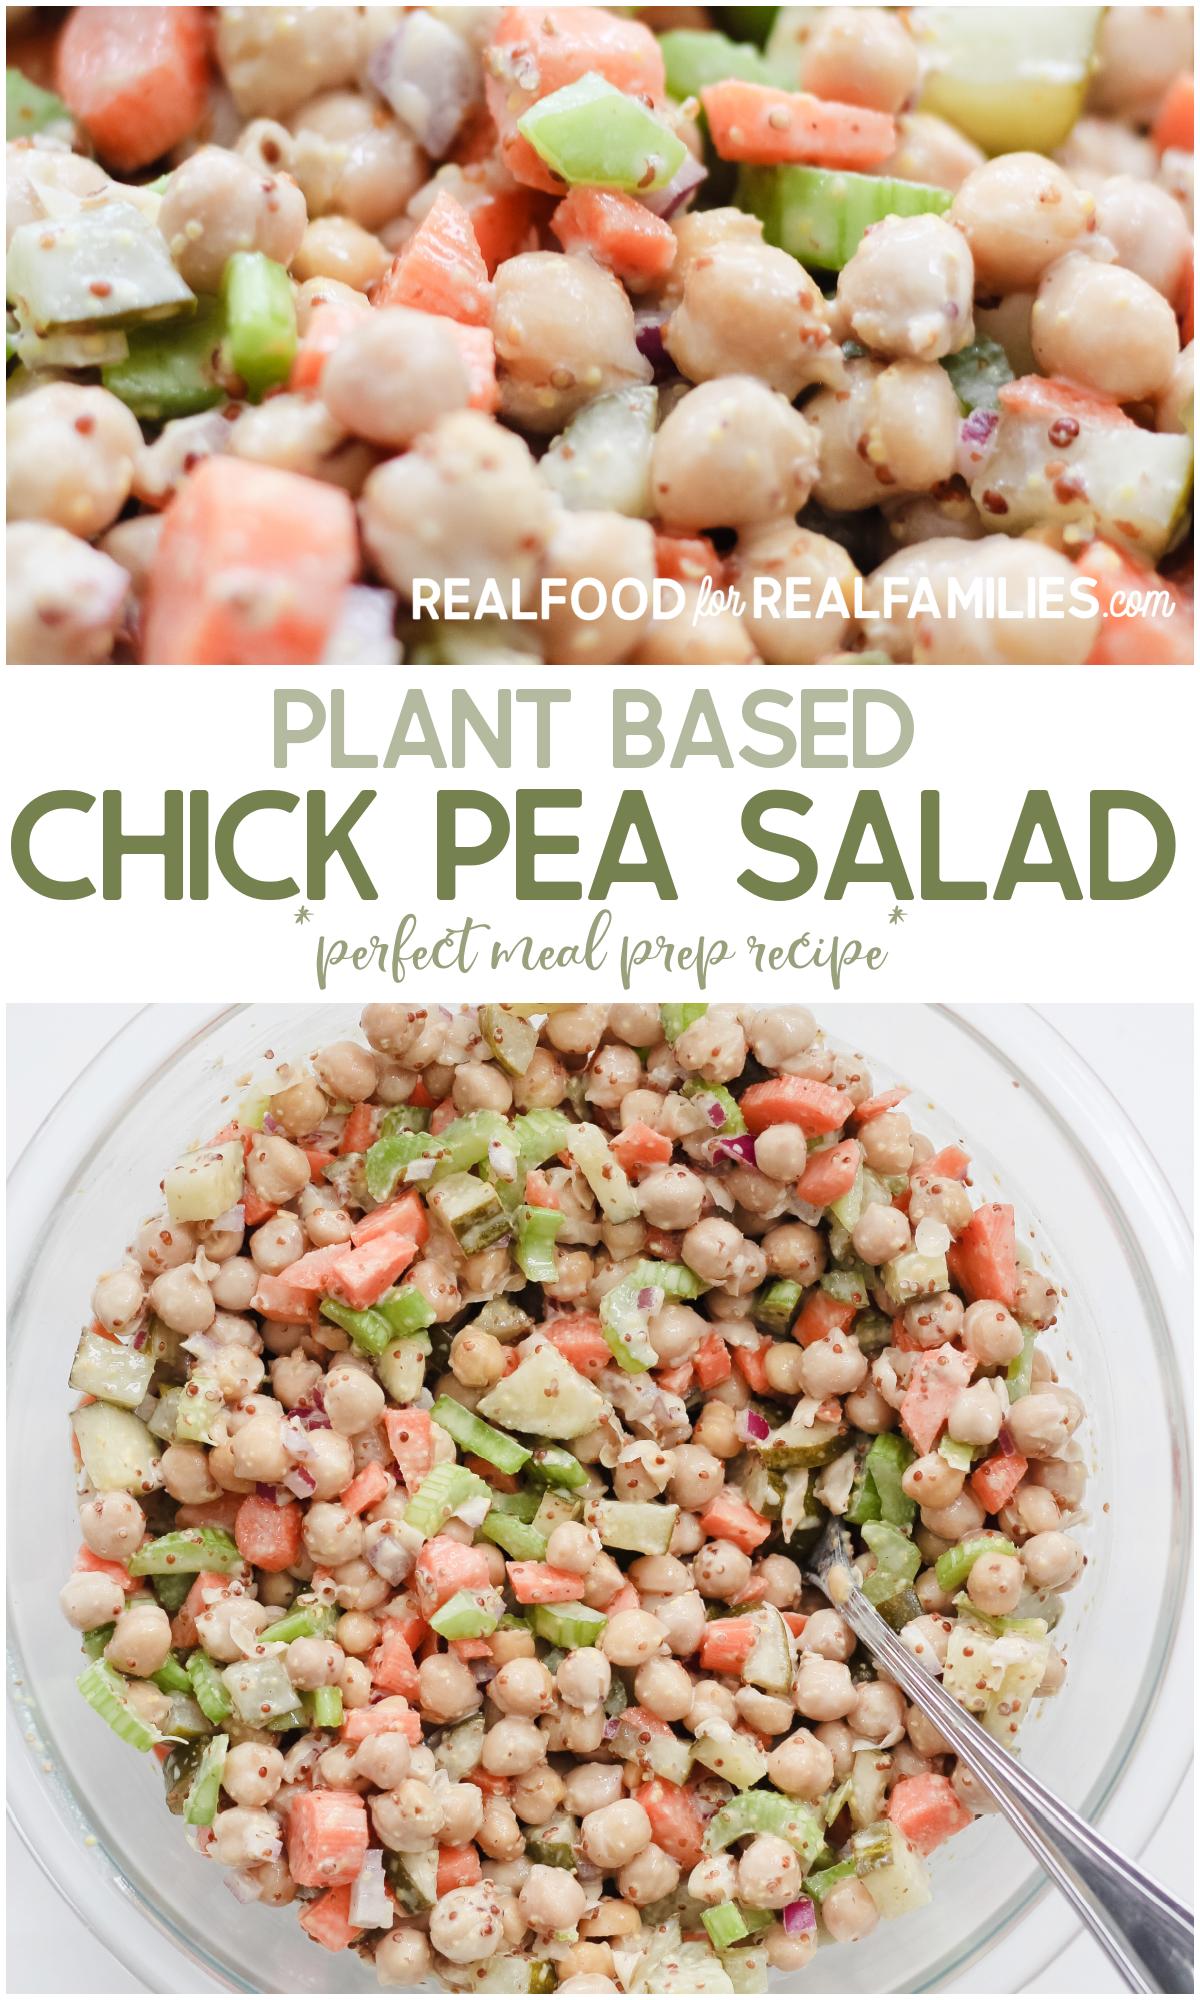 plant based chick pea salad recipe